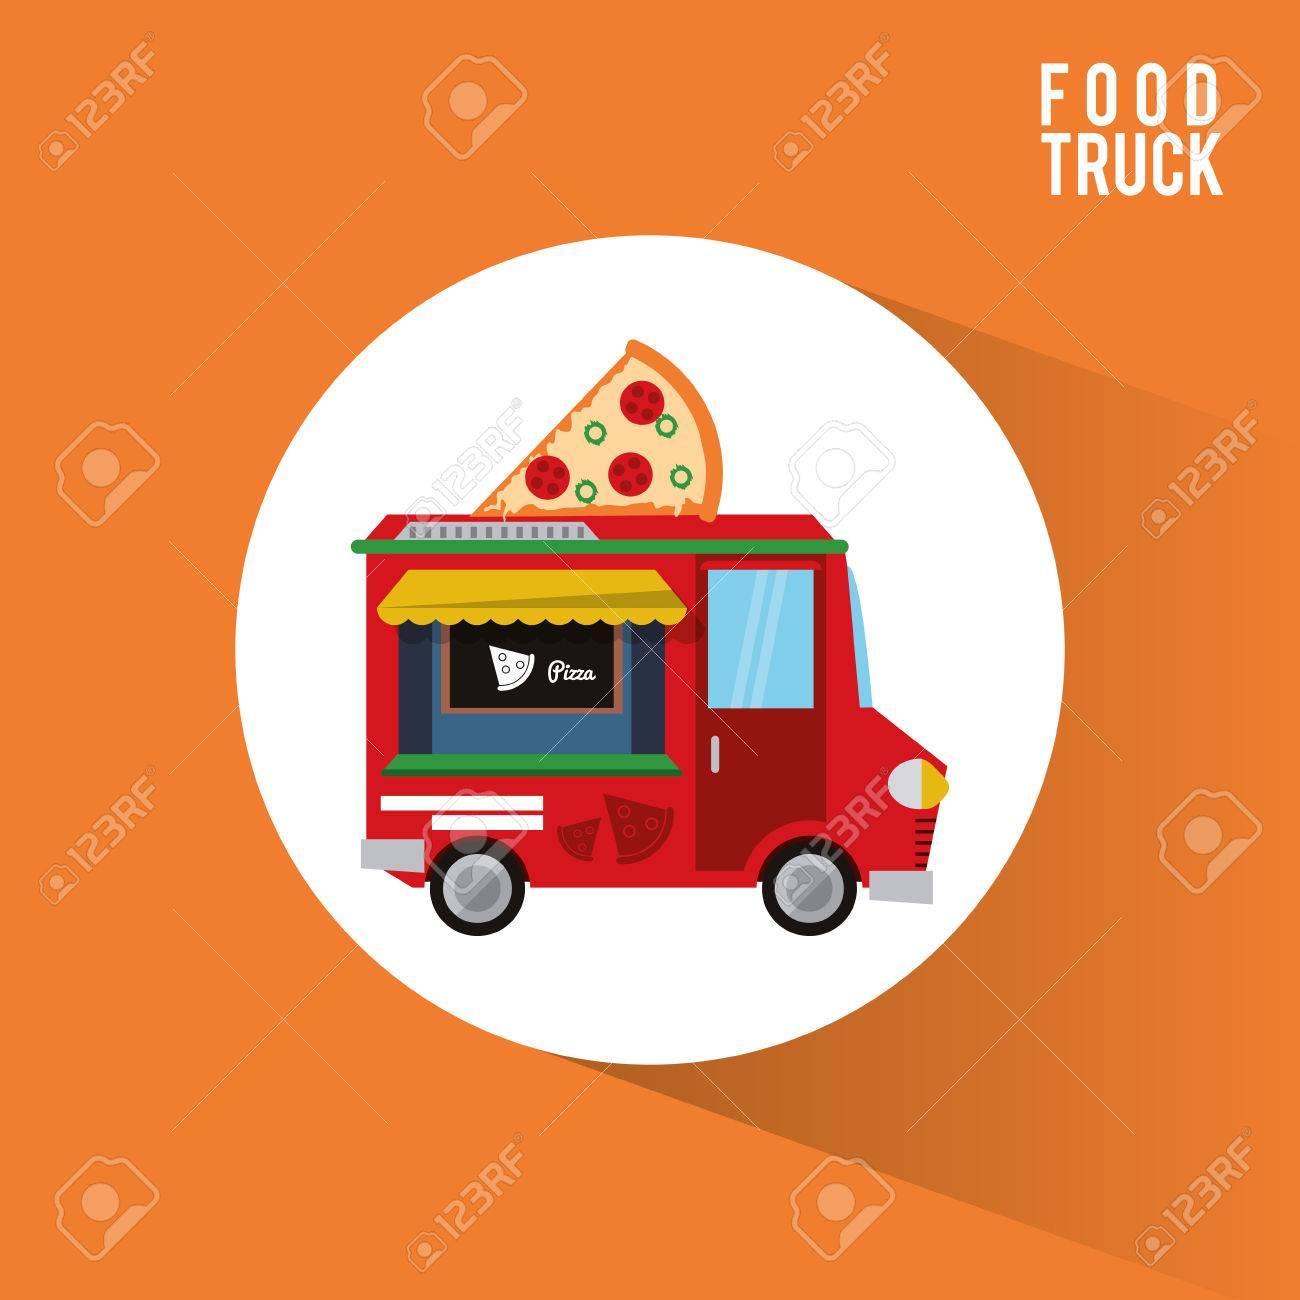 pizza food truck icon urban american culture menu and consume